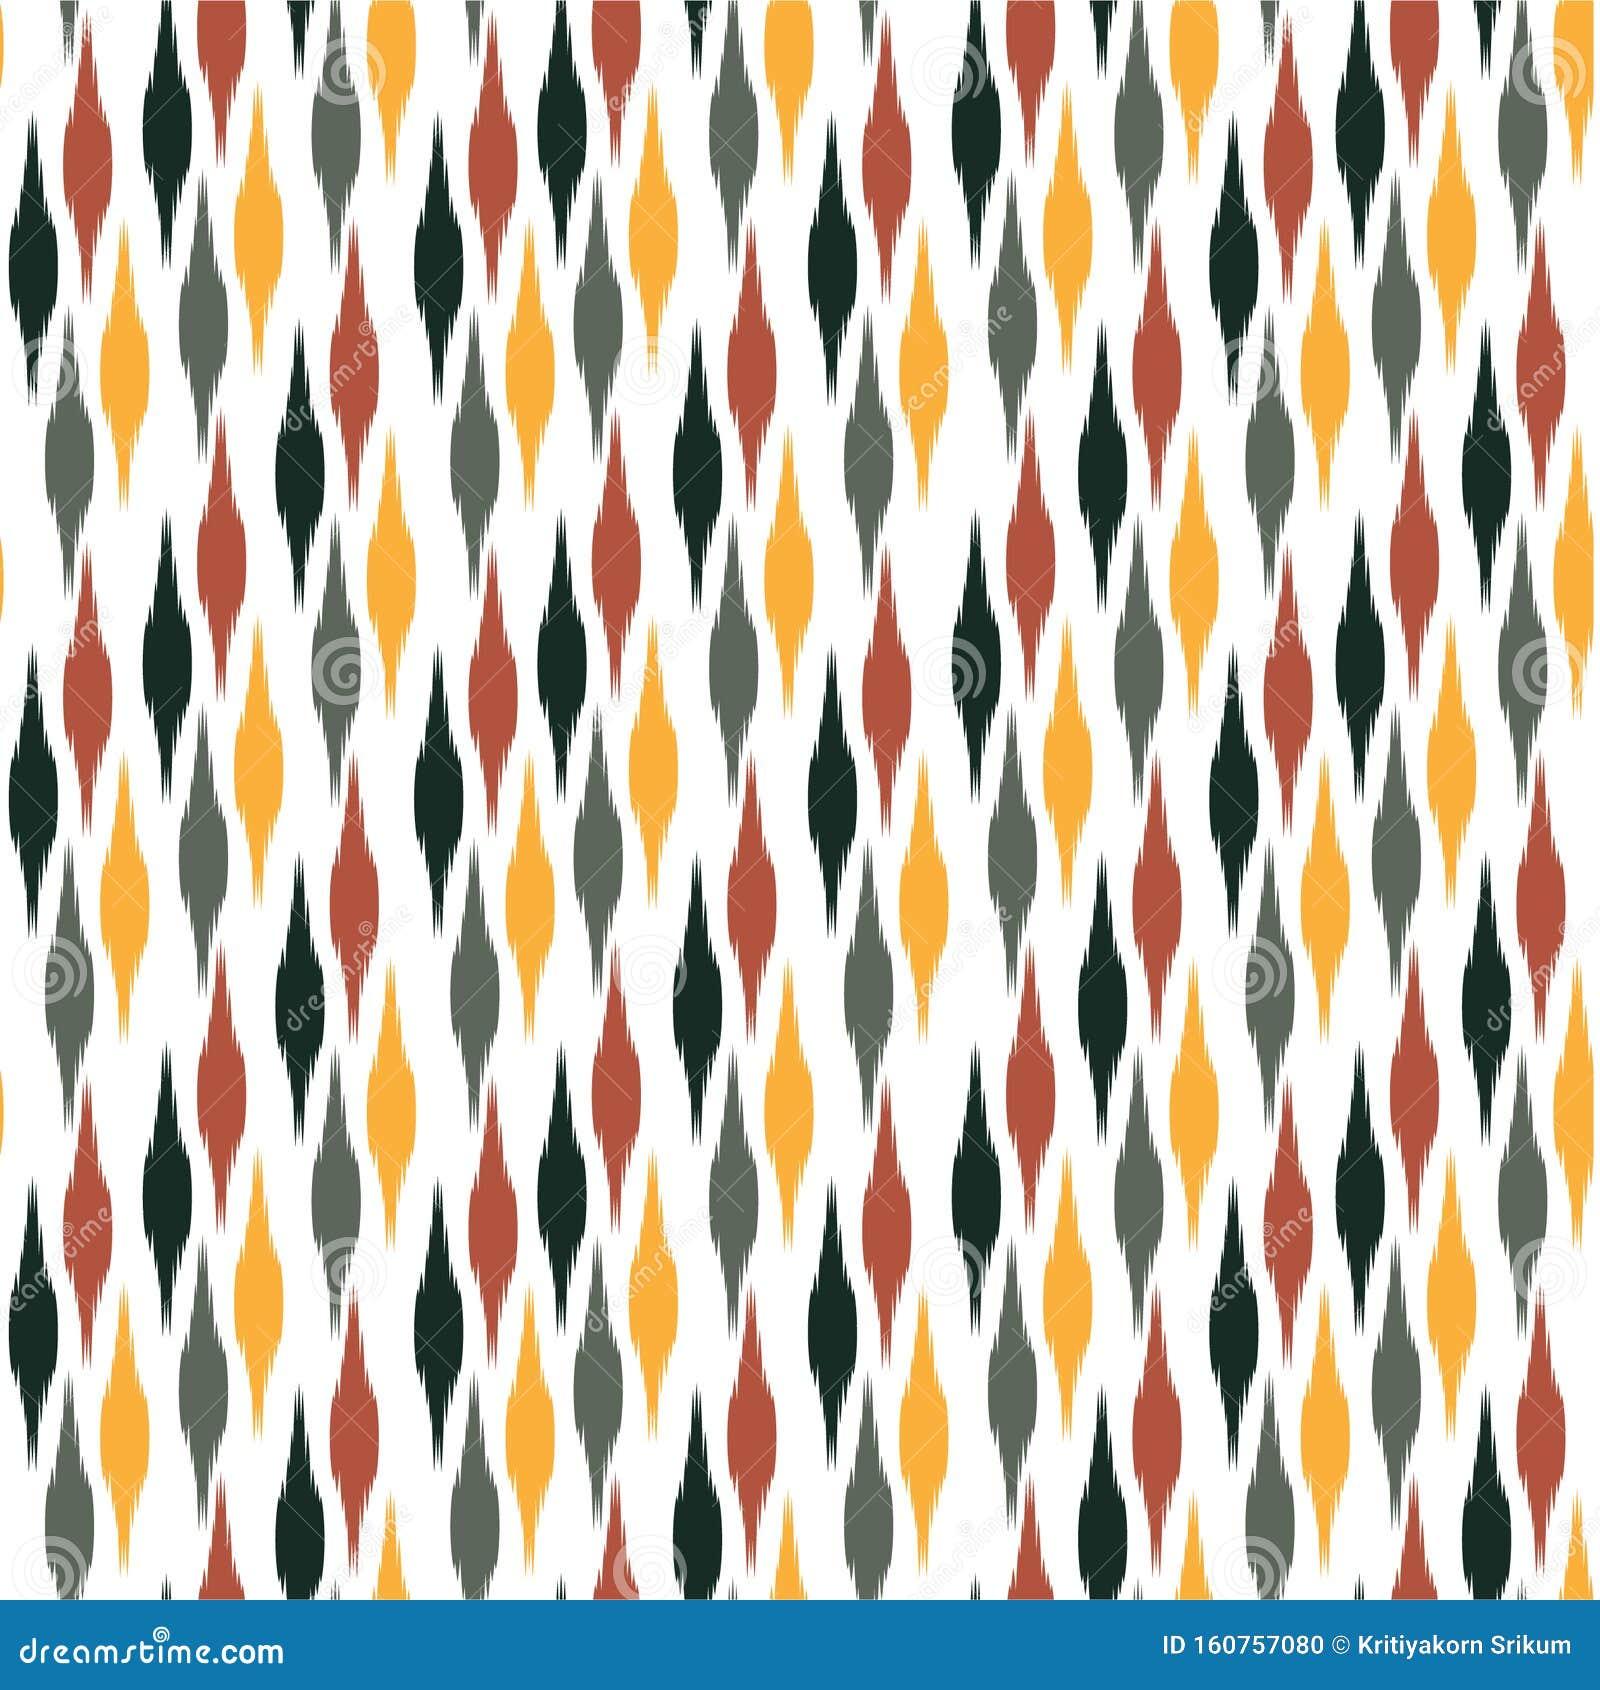 Modern Colorful Tribal Boho Iket Style Seamless Pattern Vector